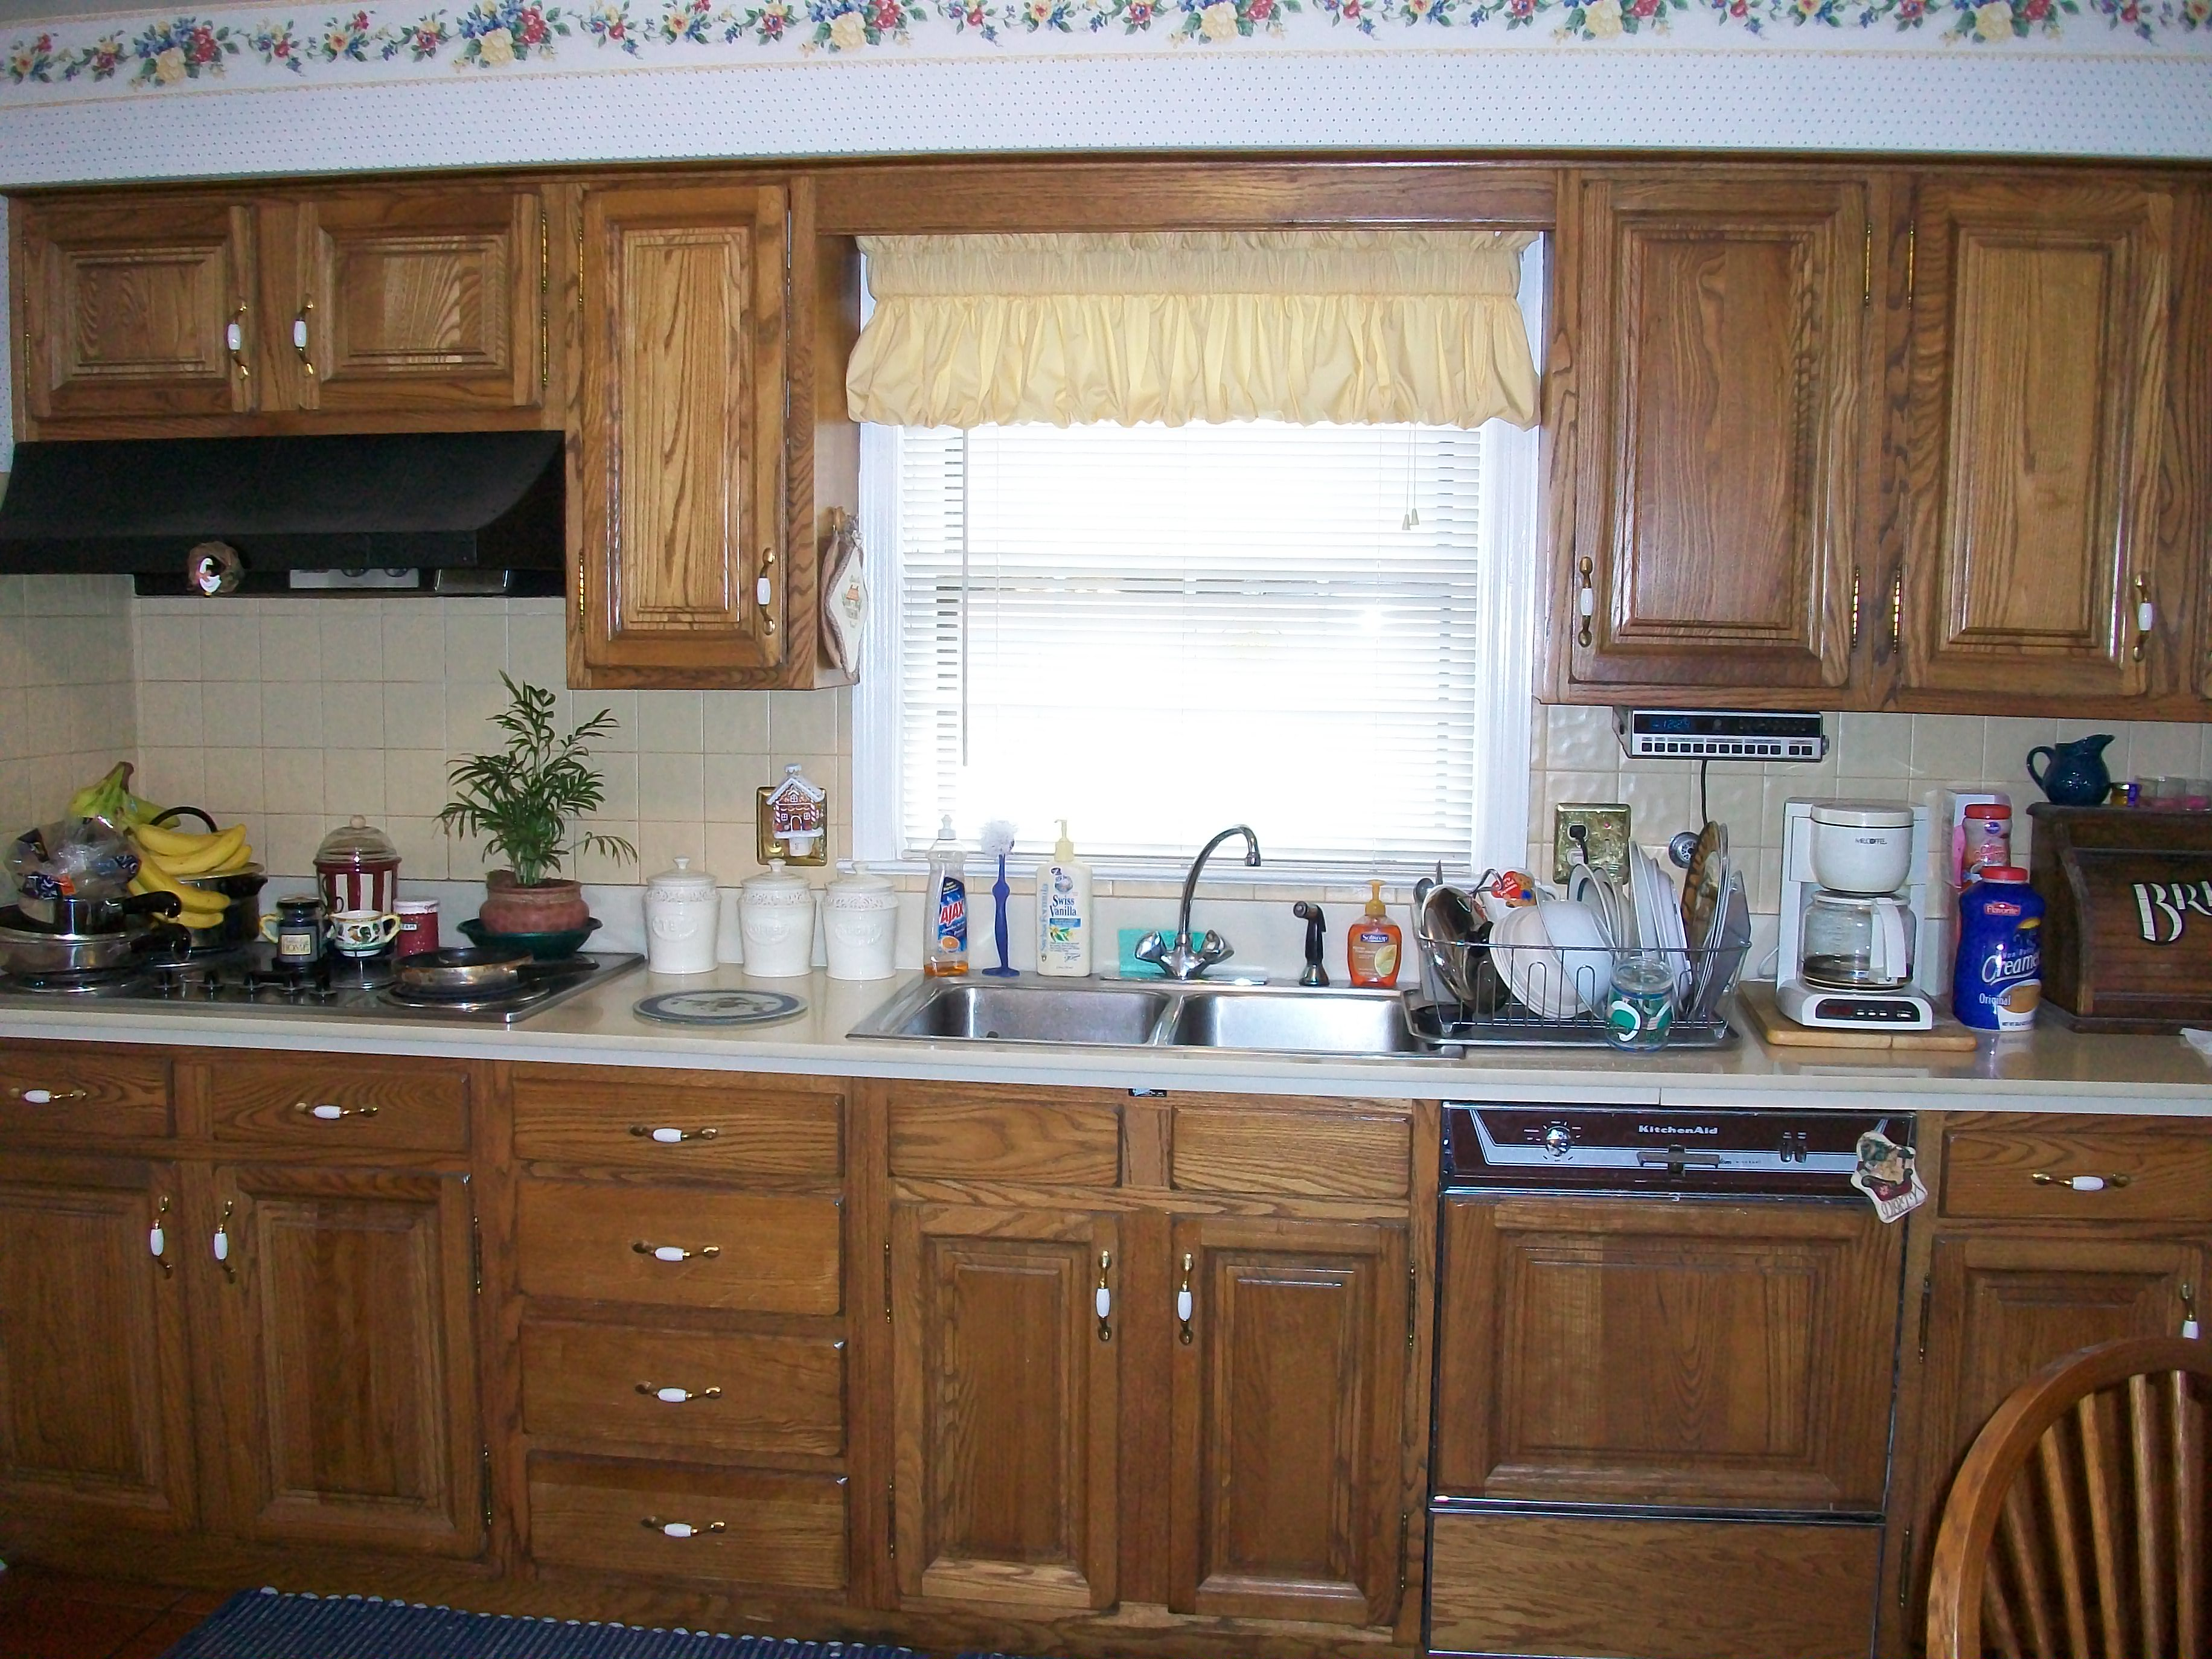 door knobs kitchen cabinets photo - 20